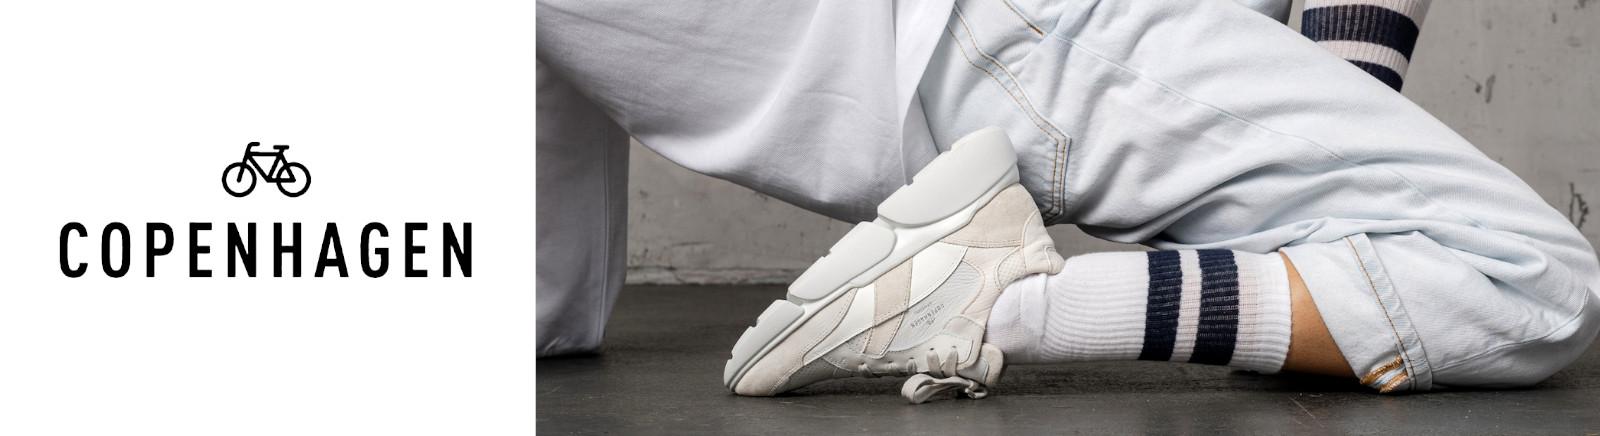 Copenhagen Herrenschuhe online kaufen im GISY Schuhe Shop